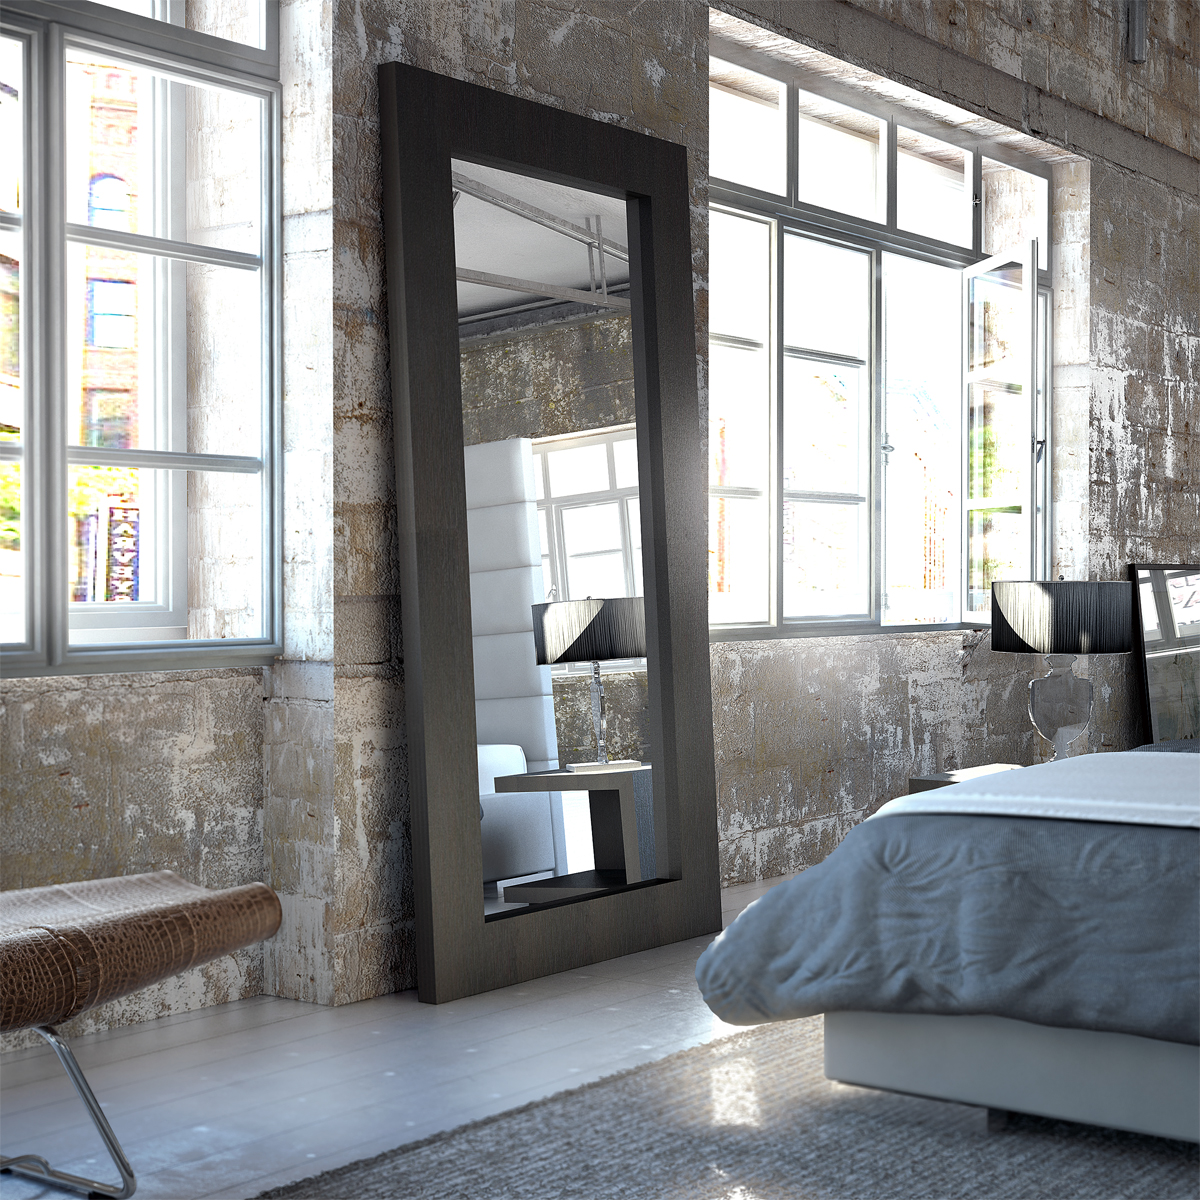 Modloft Madison Bed | Modloft Monroe Bed | Modloft